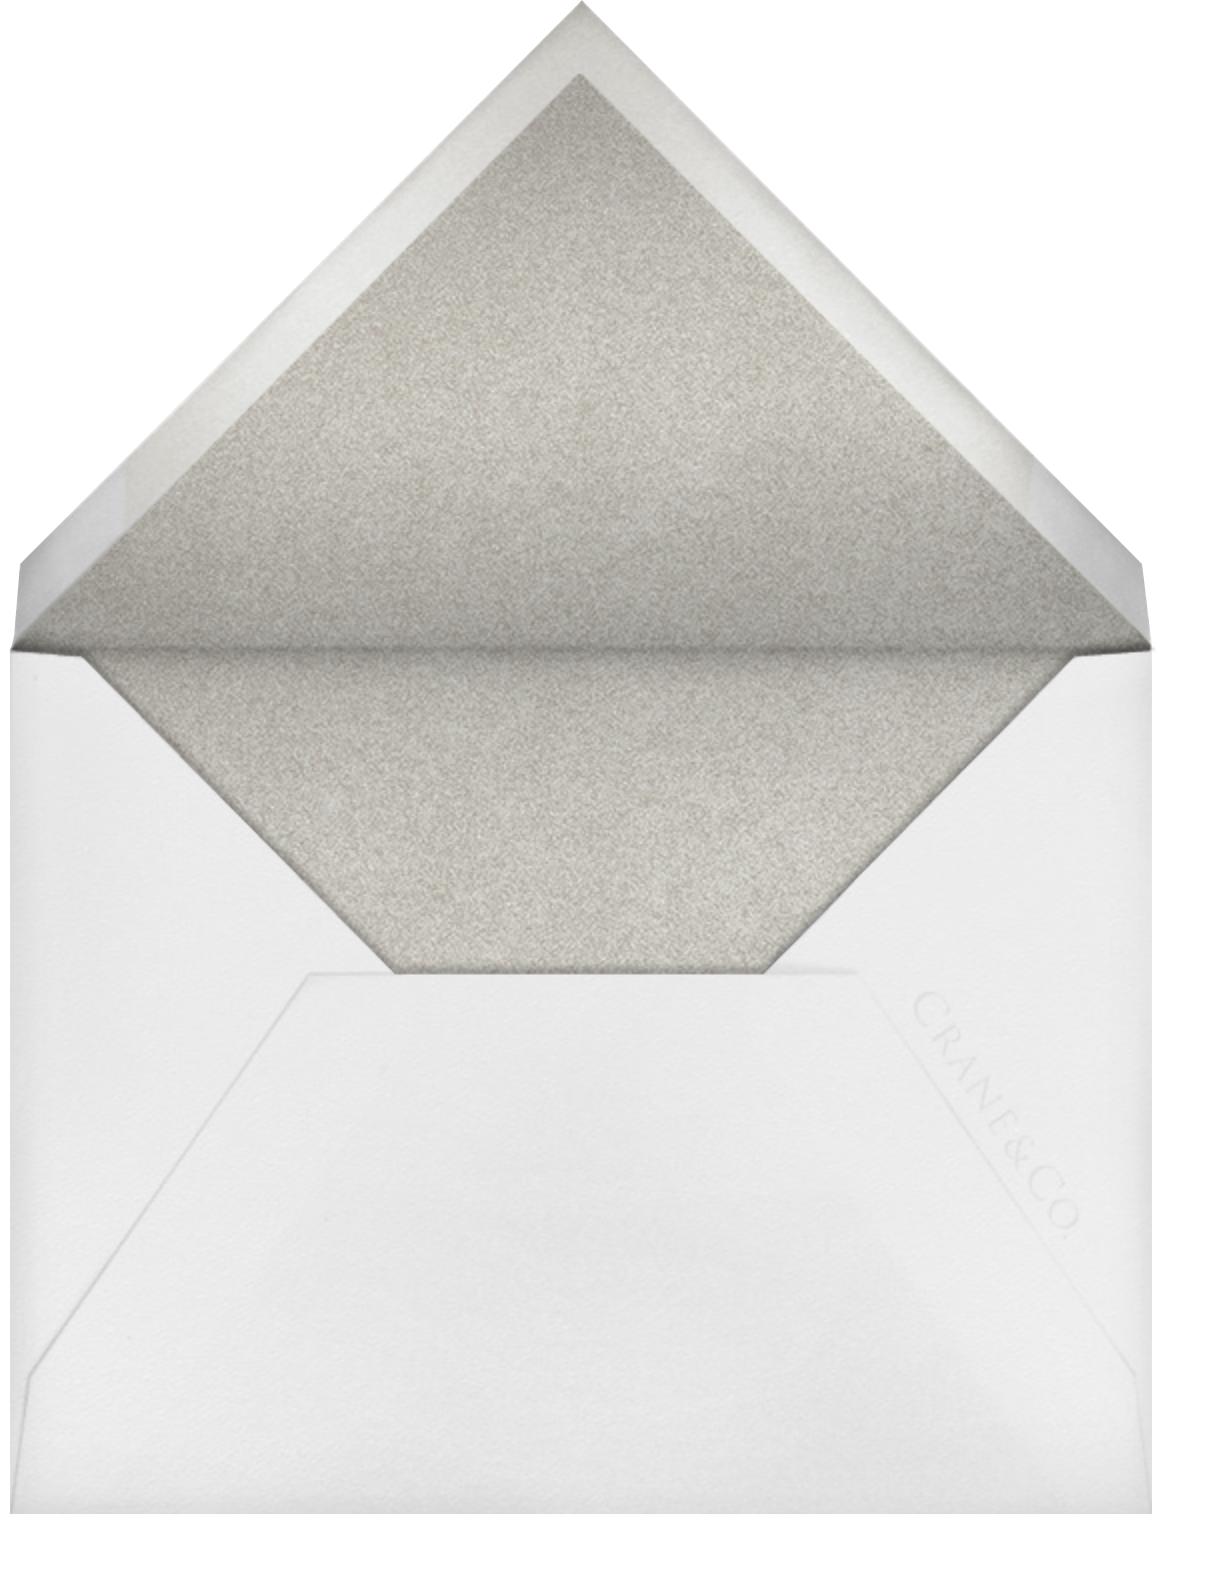 Notch - Platinum - Vera Wang - All - envelope back